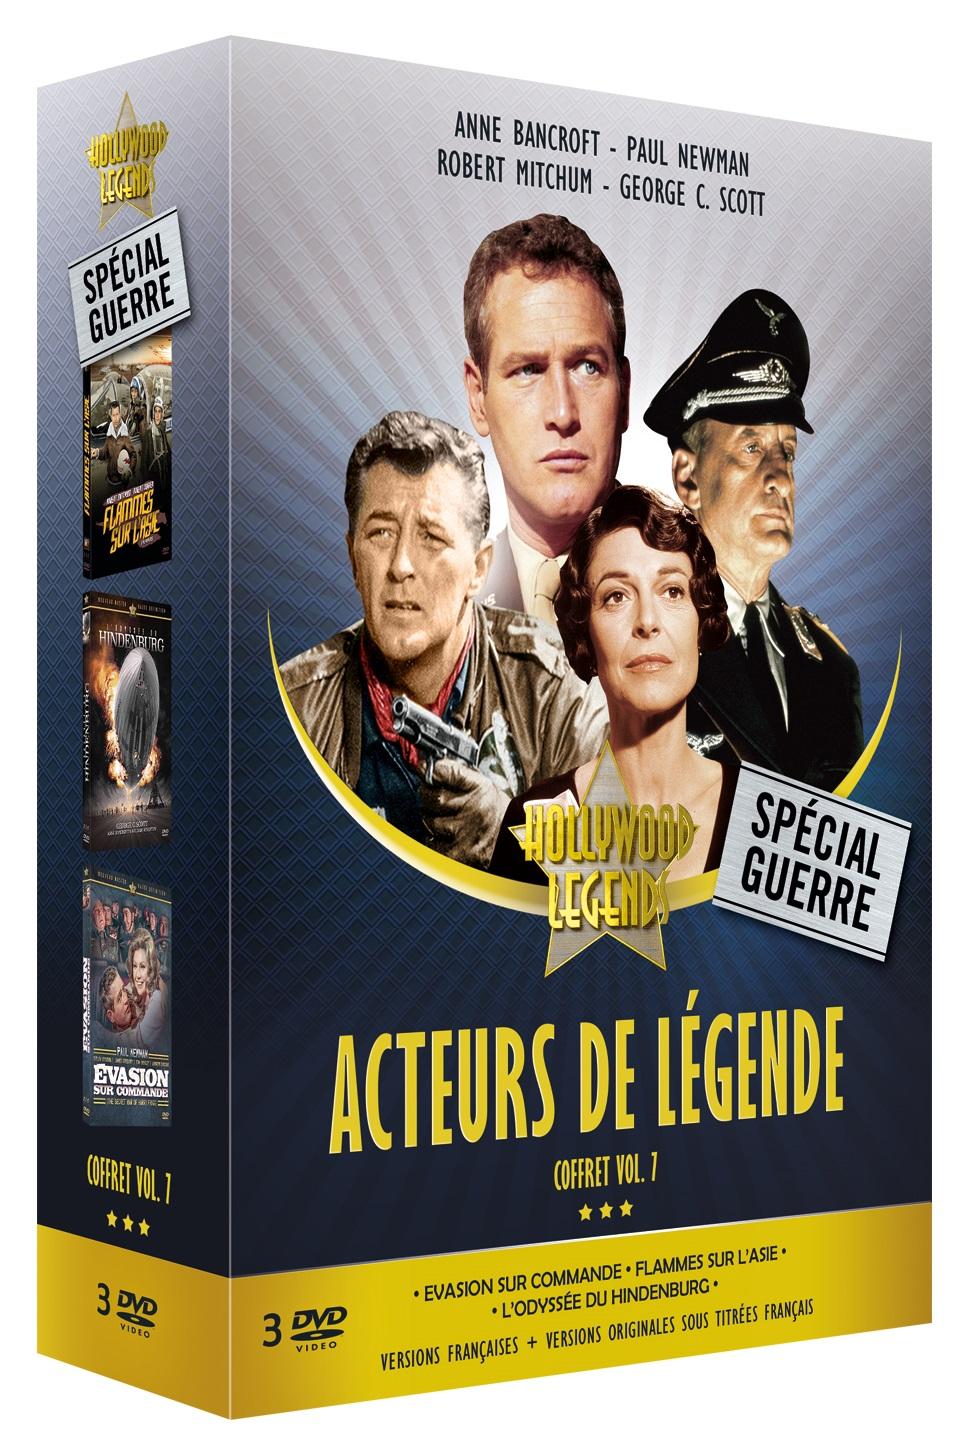 ACTEURS DE LÉGENDE VOL. 7